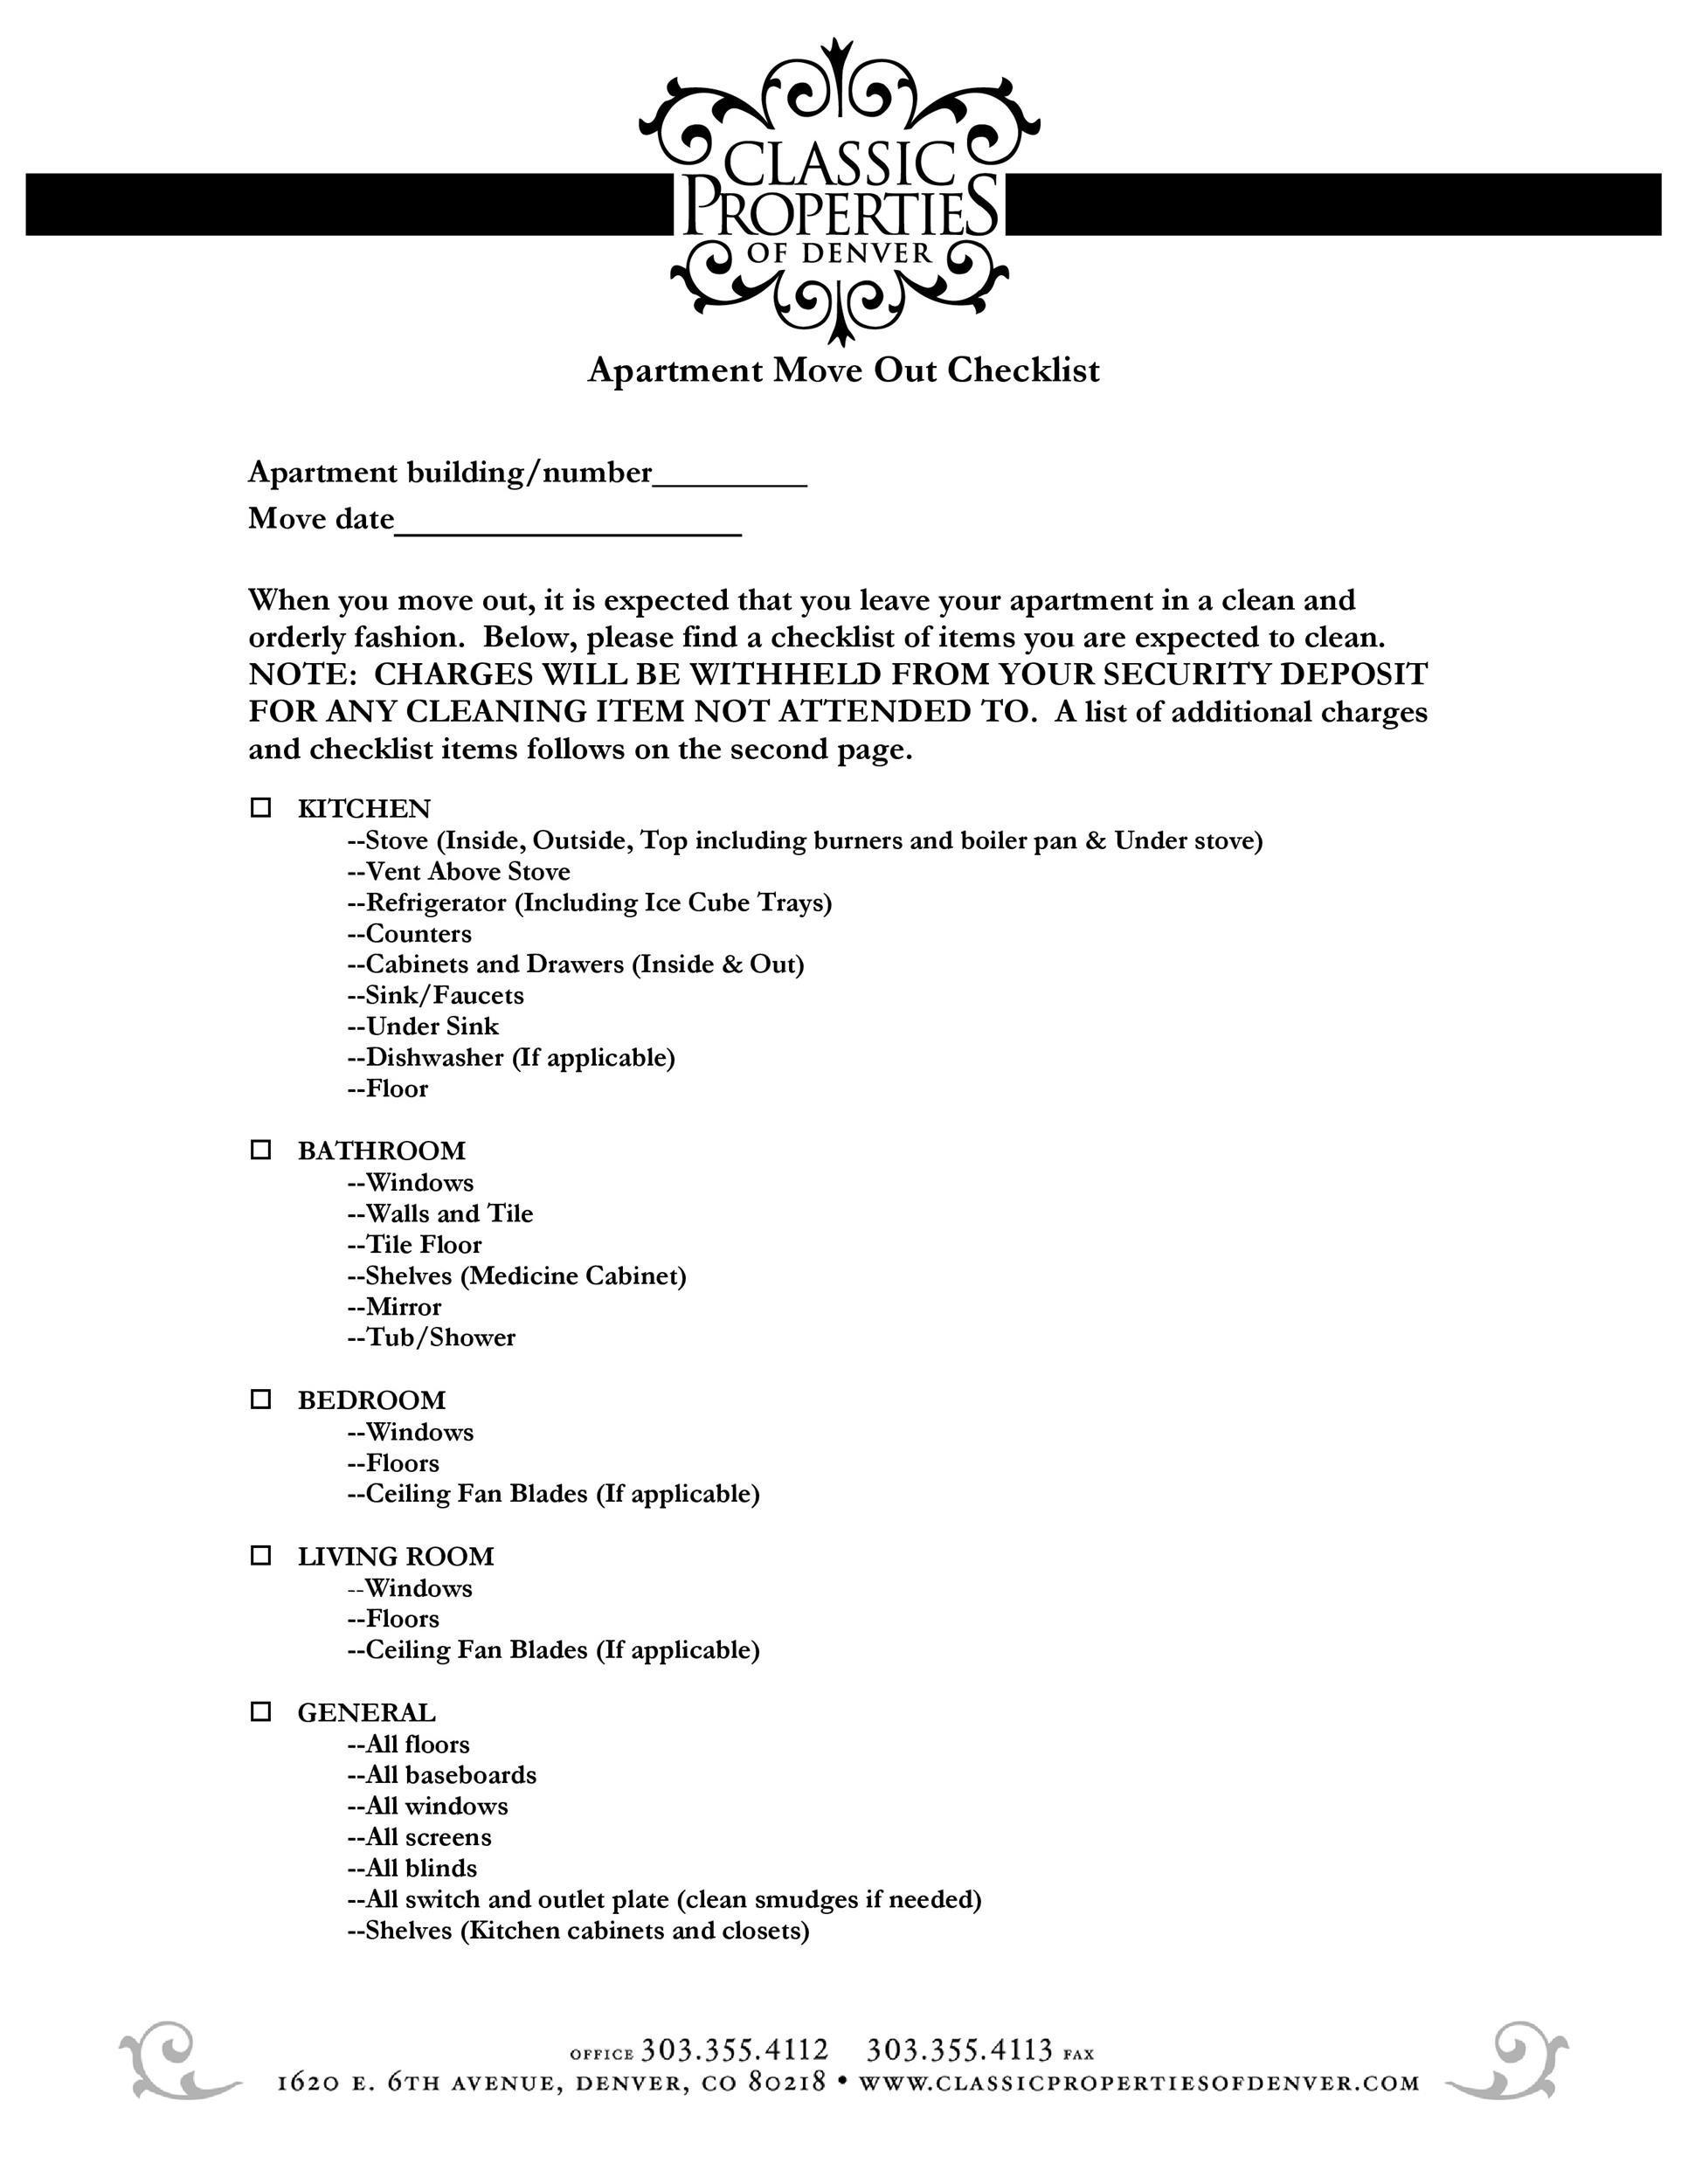 Free apartment checklist 04